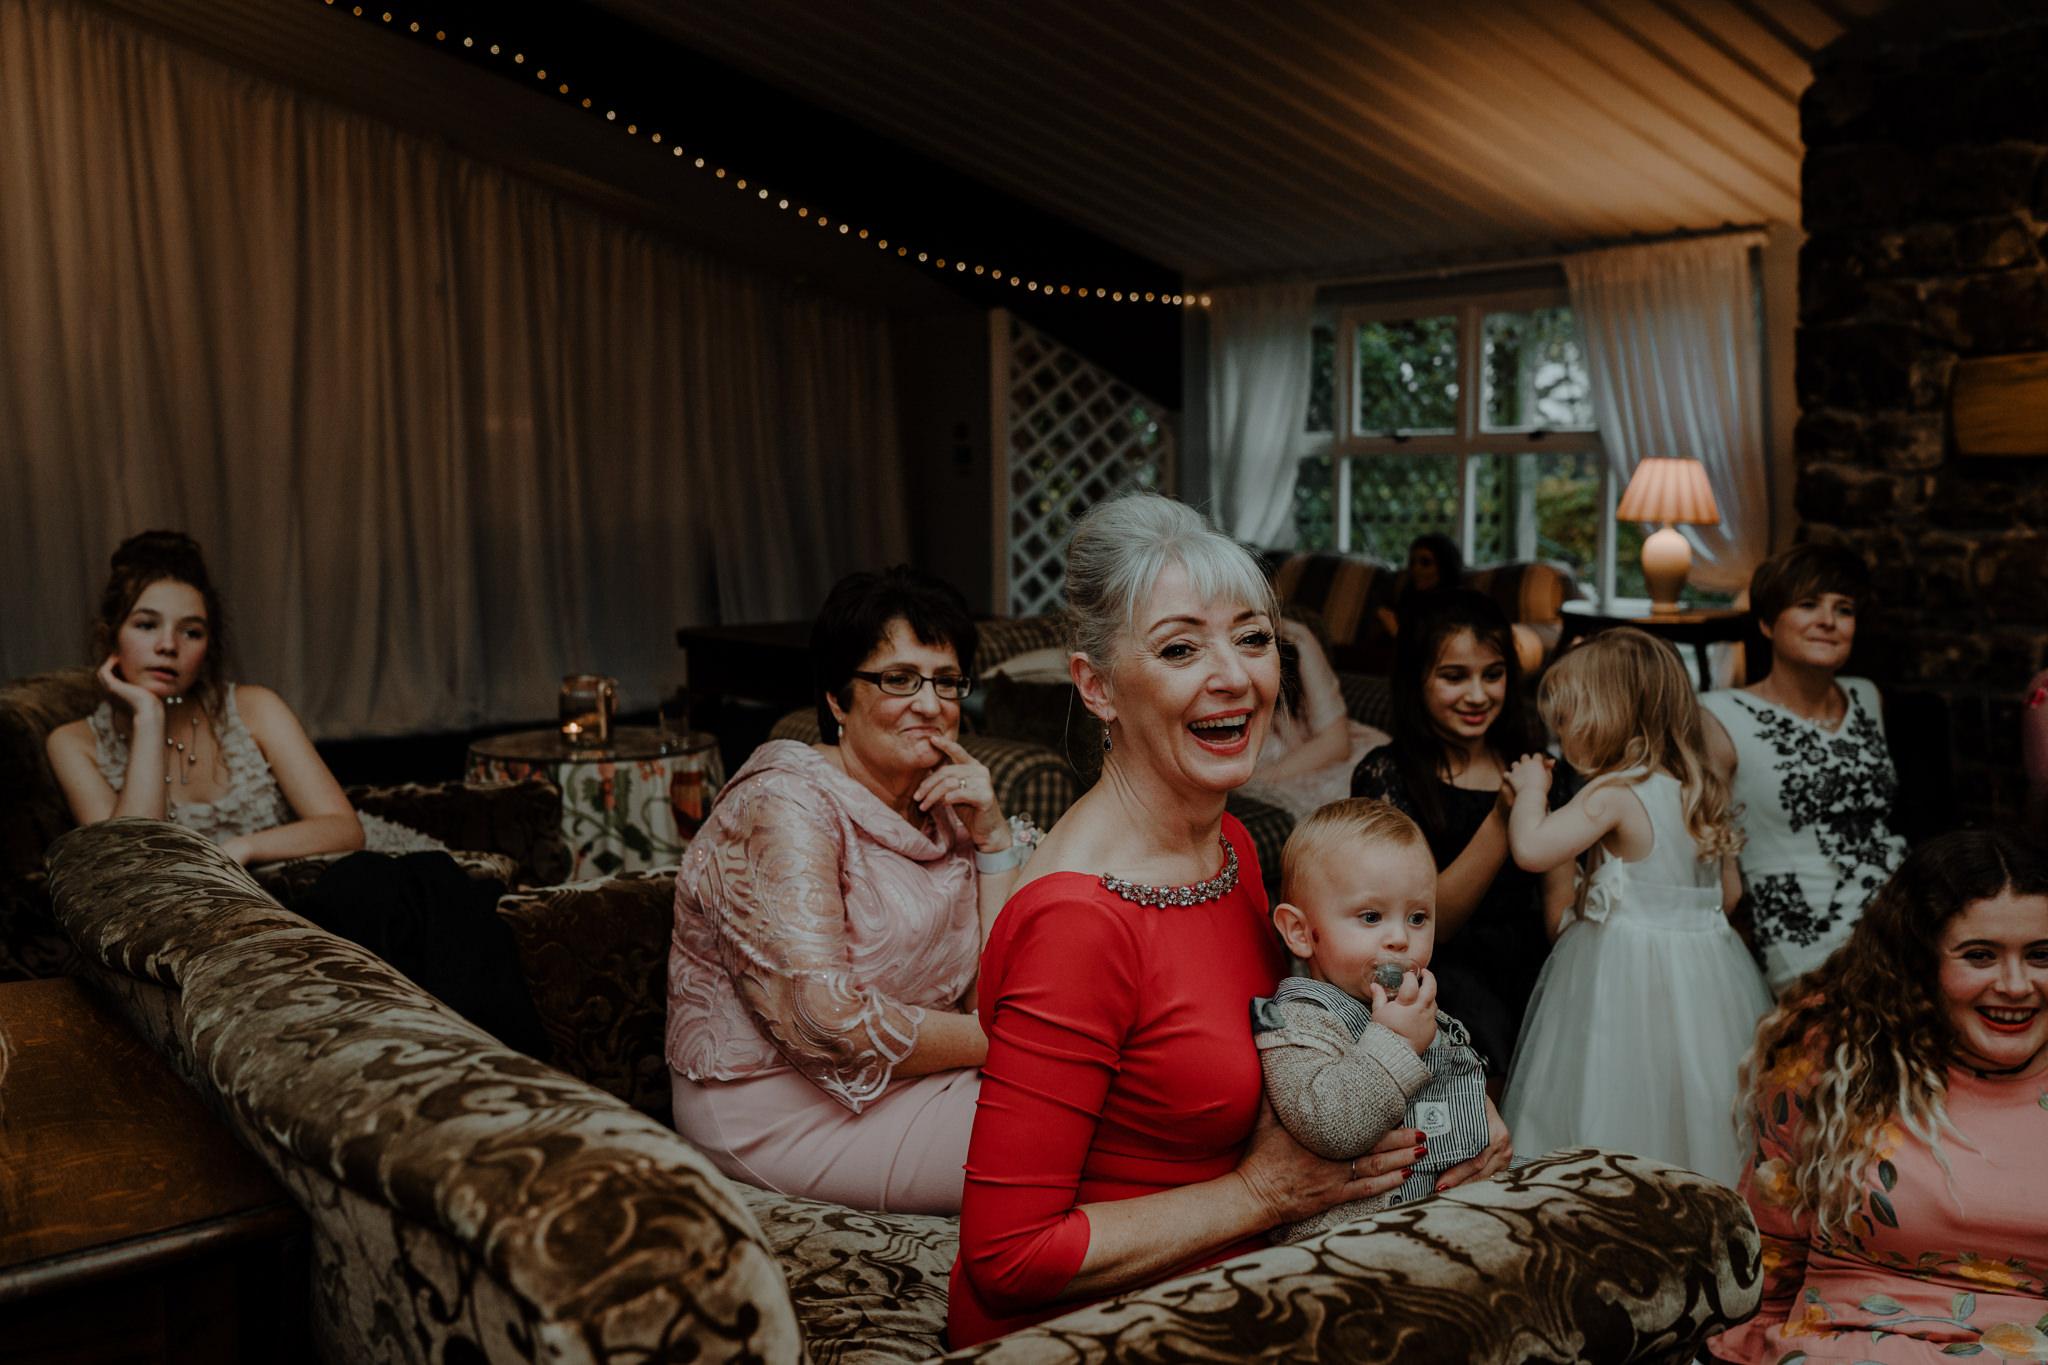 Lissanoure-wedding-holohans-209.jpg